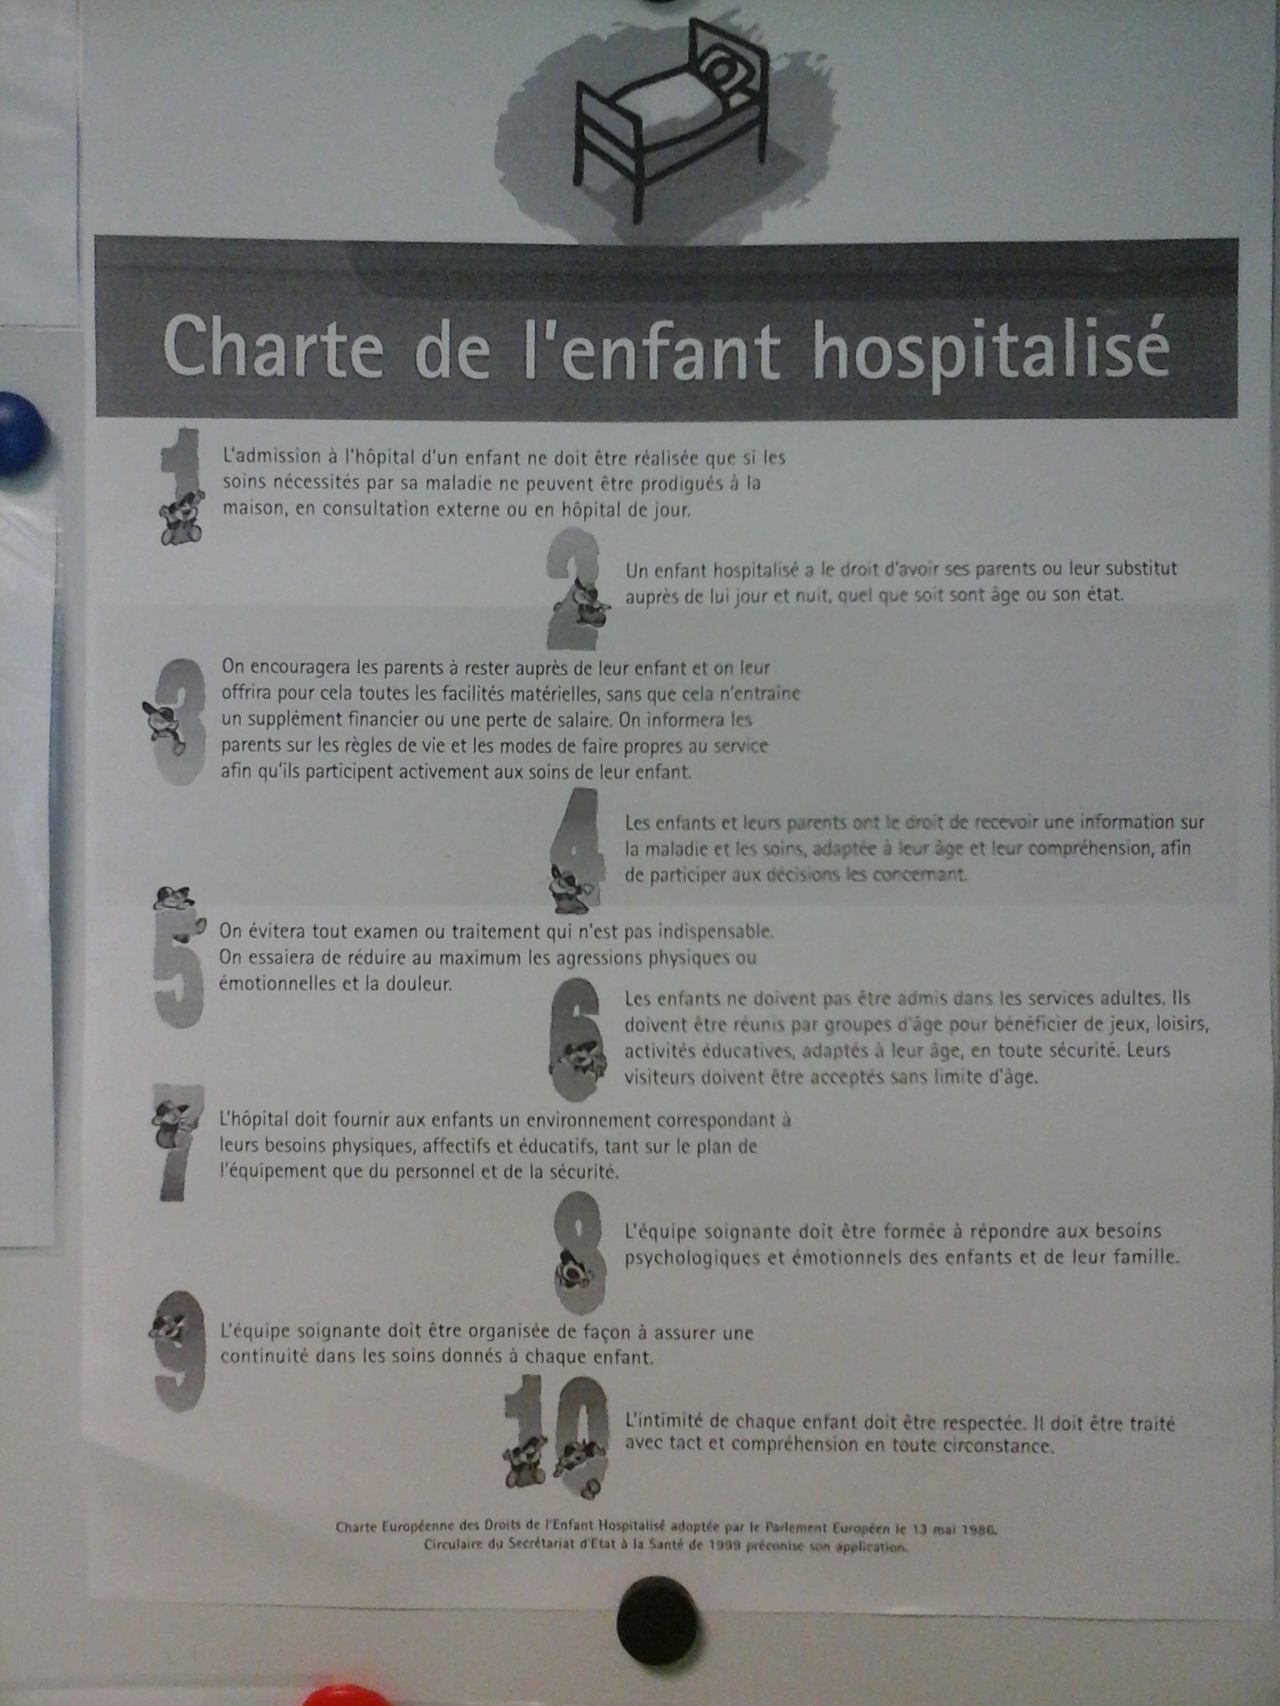 charte-enfant-hospitalisé.jpg